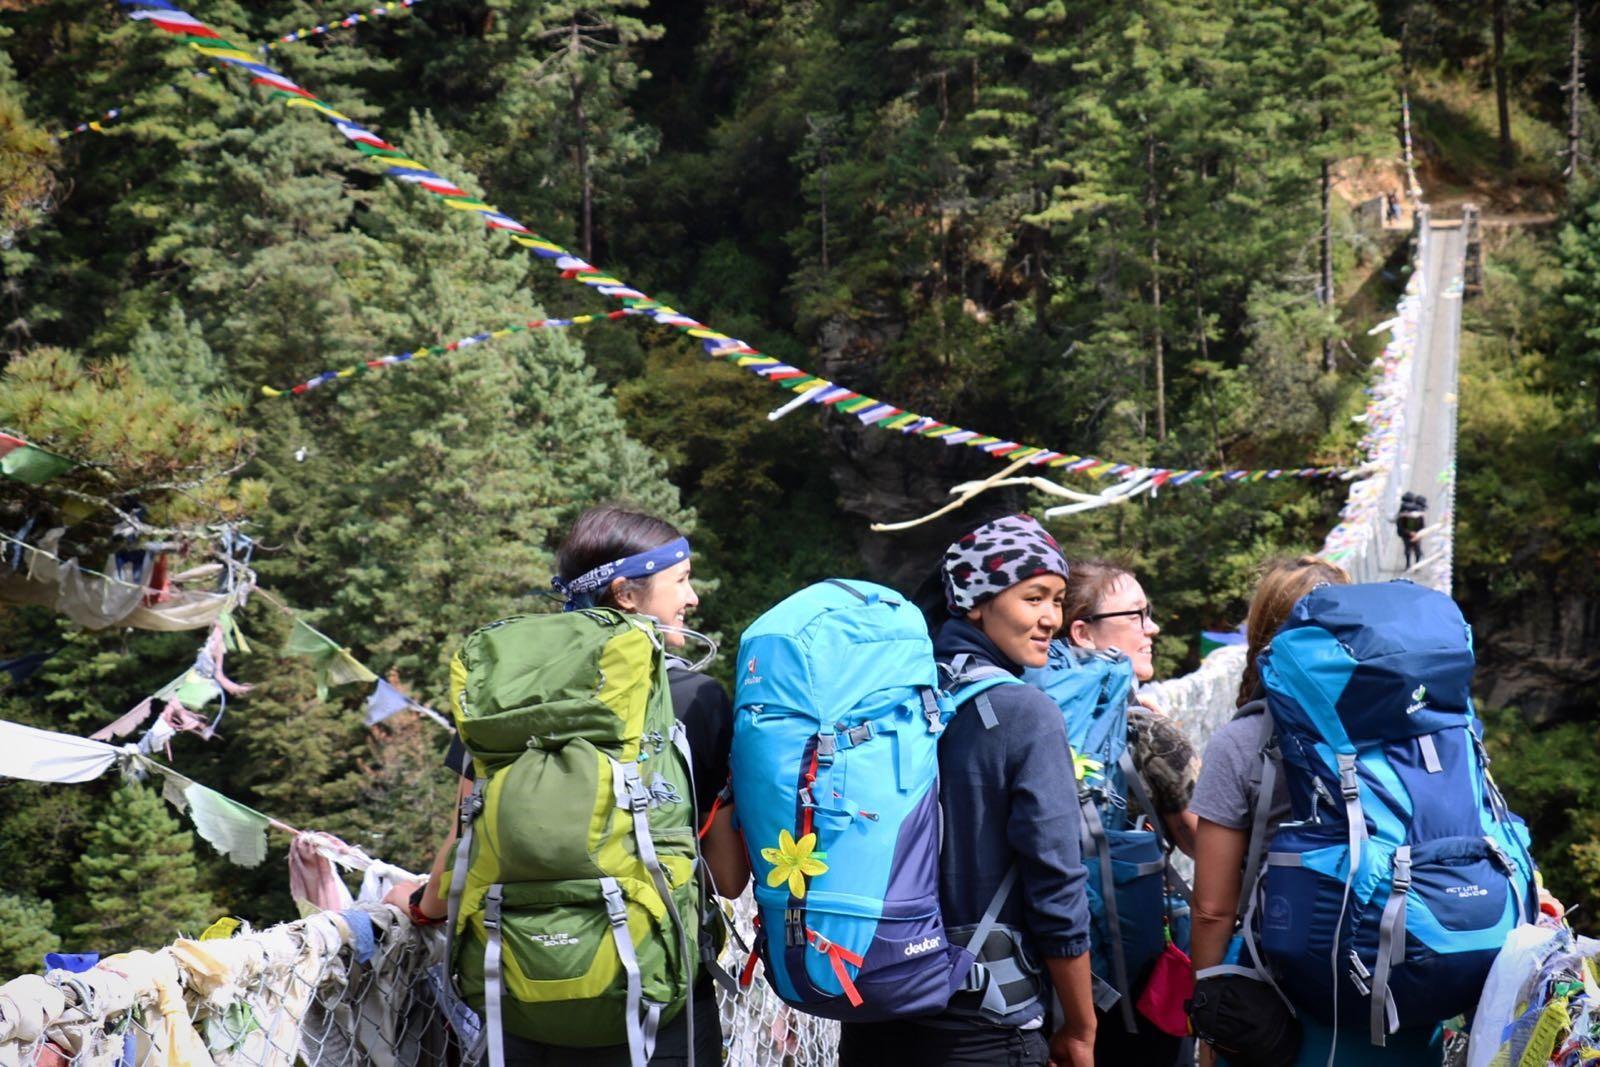 Kim, Phurba, Tammy and Ida on the trek from Lukla to Imja Tse basecamp. (Photo credit: Kim Couri)